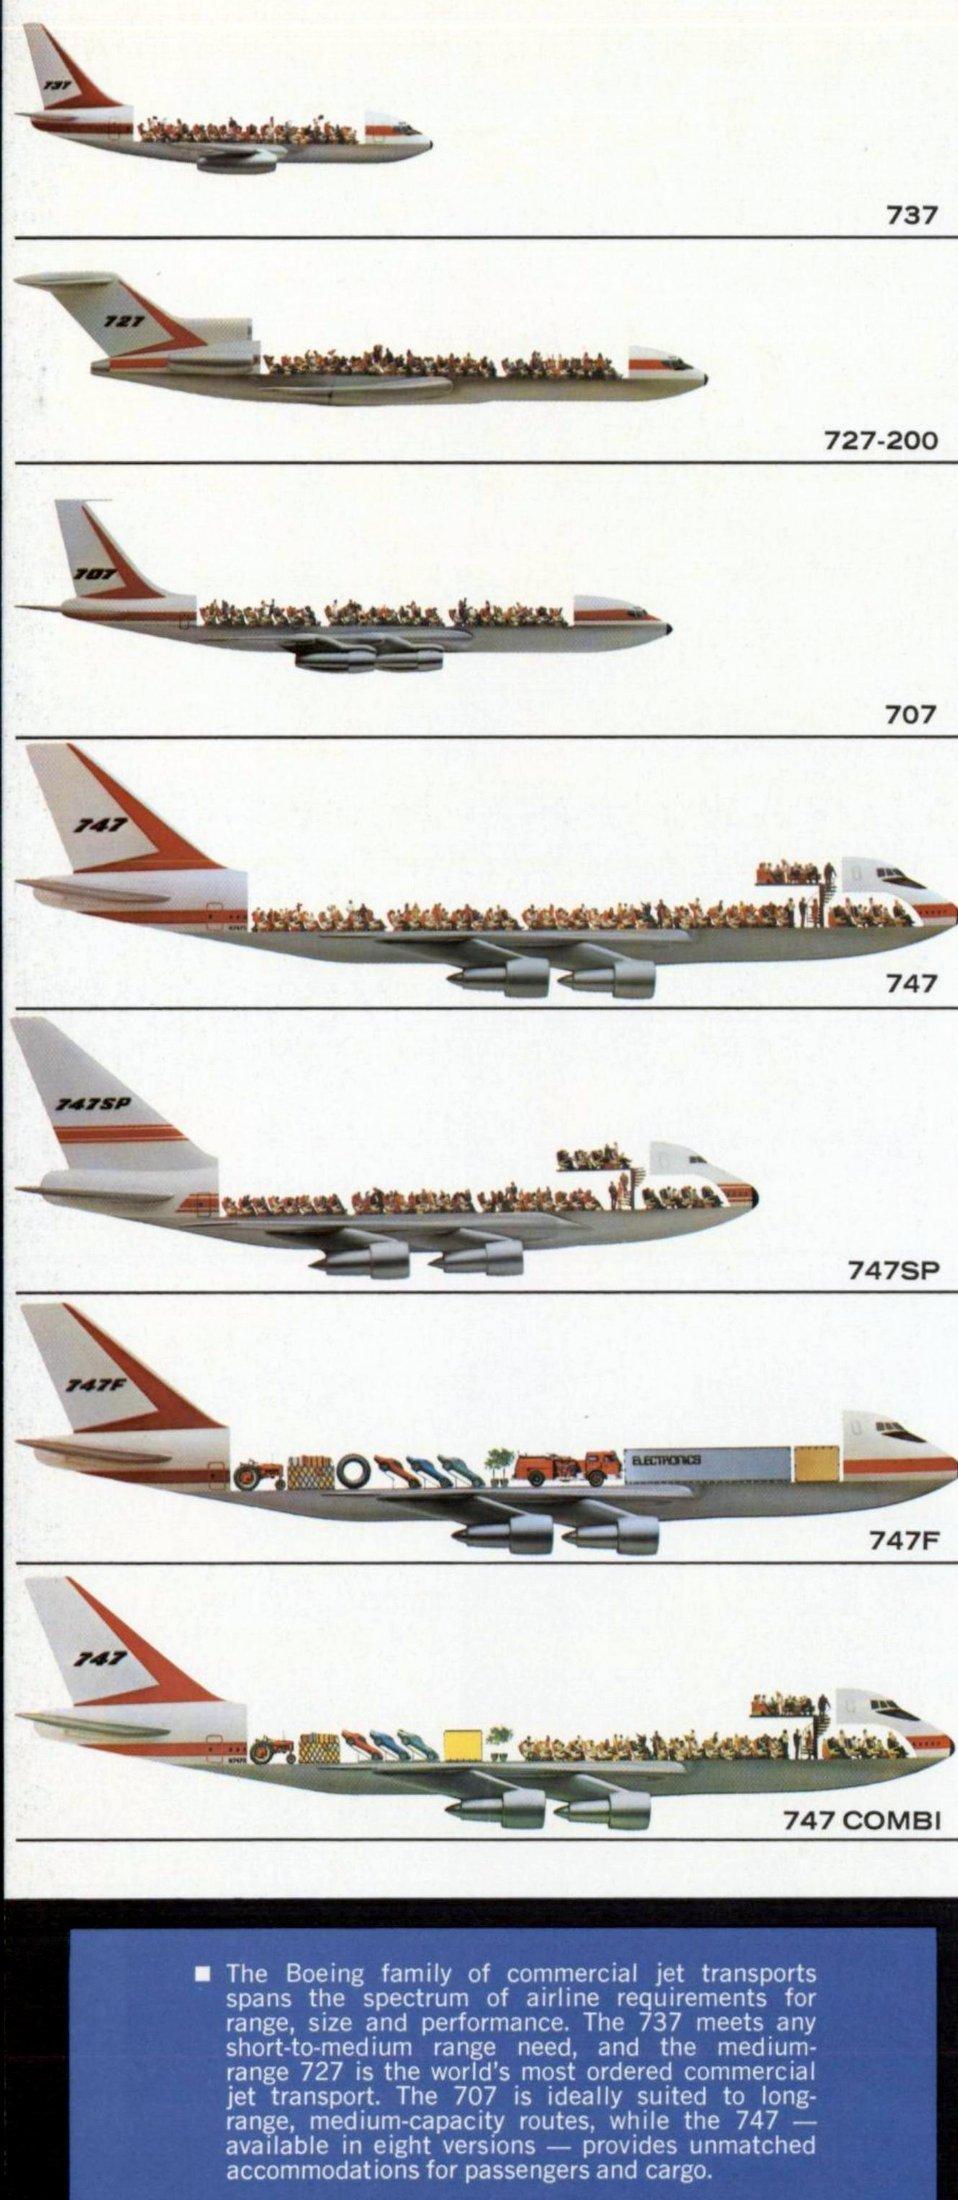 Vintage Boeing jets as of 1974